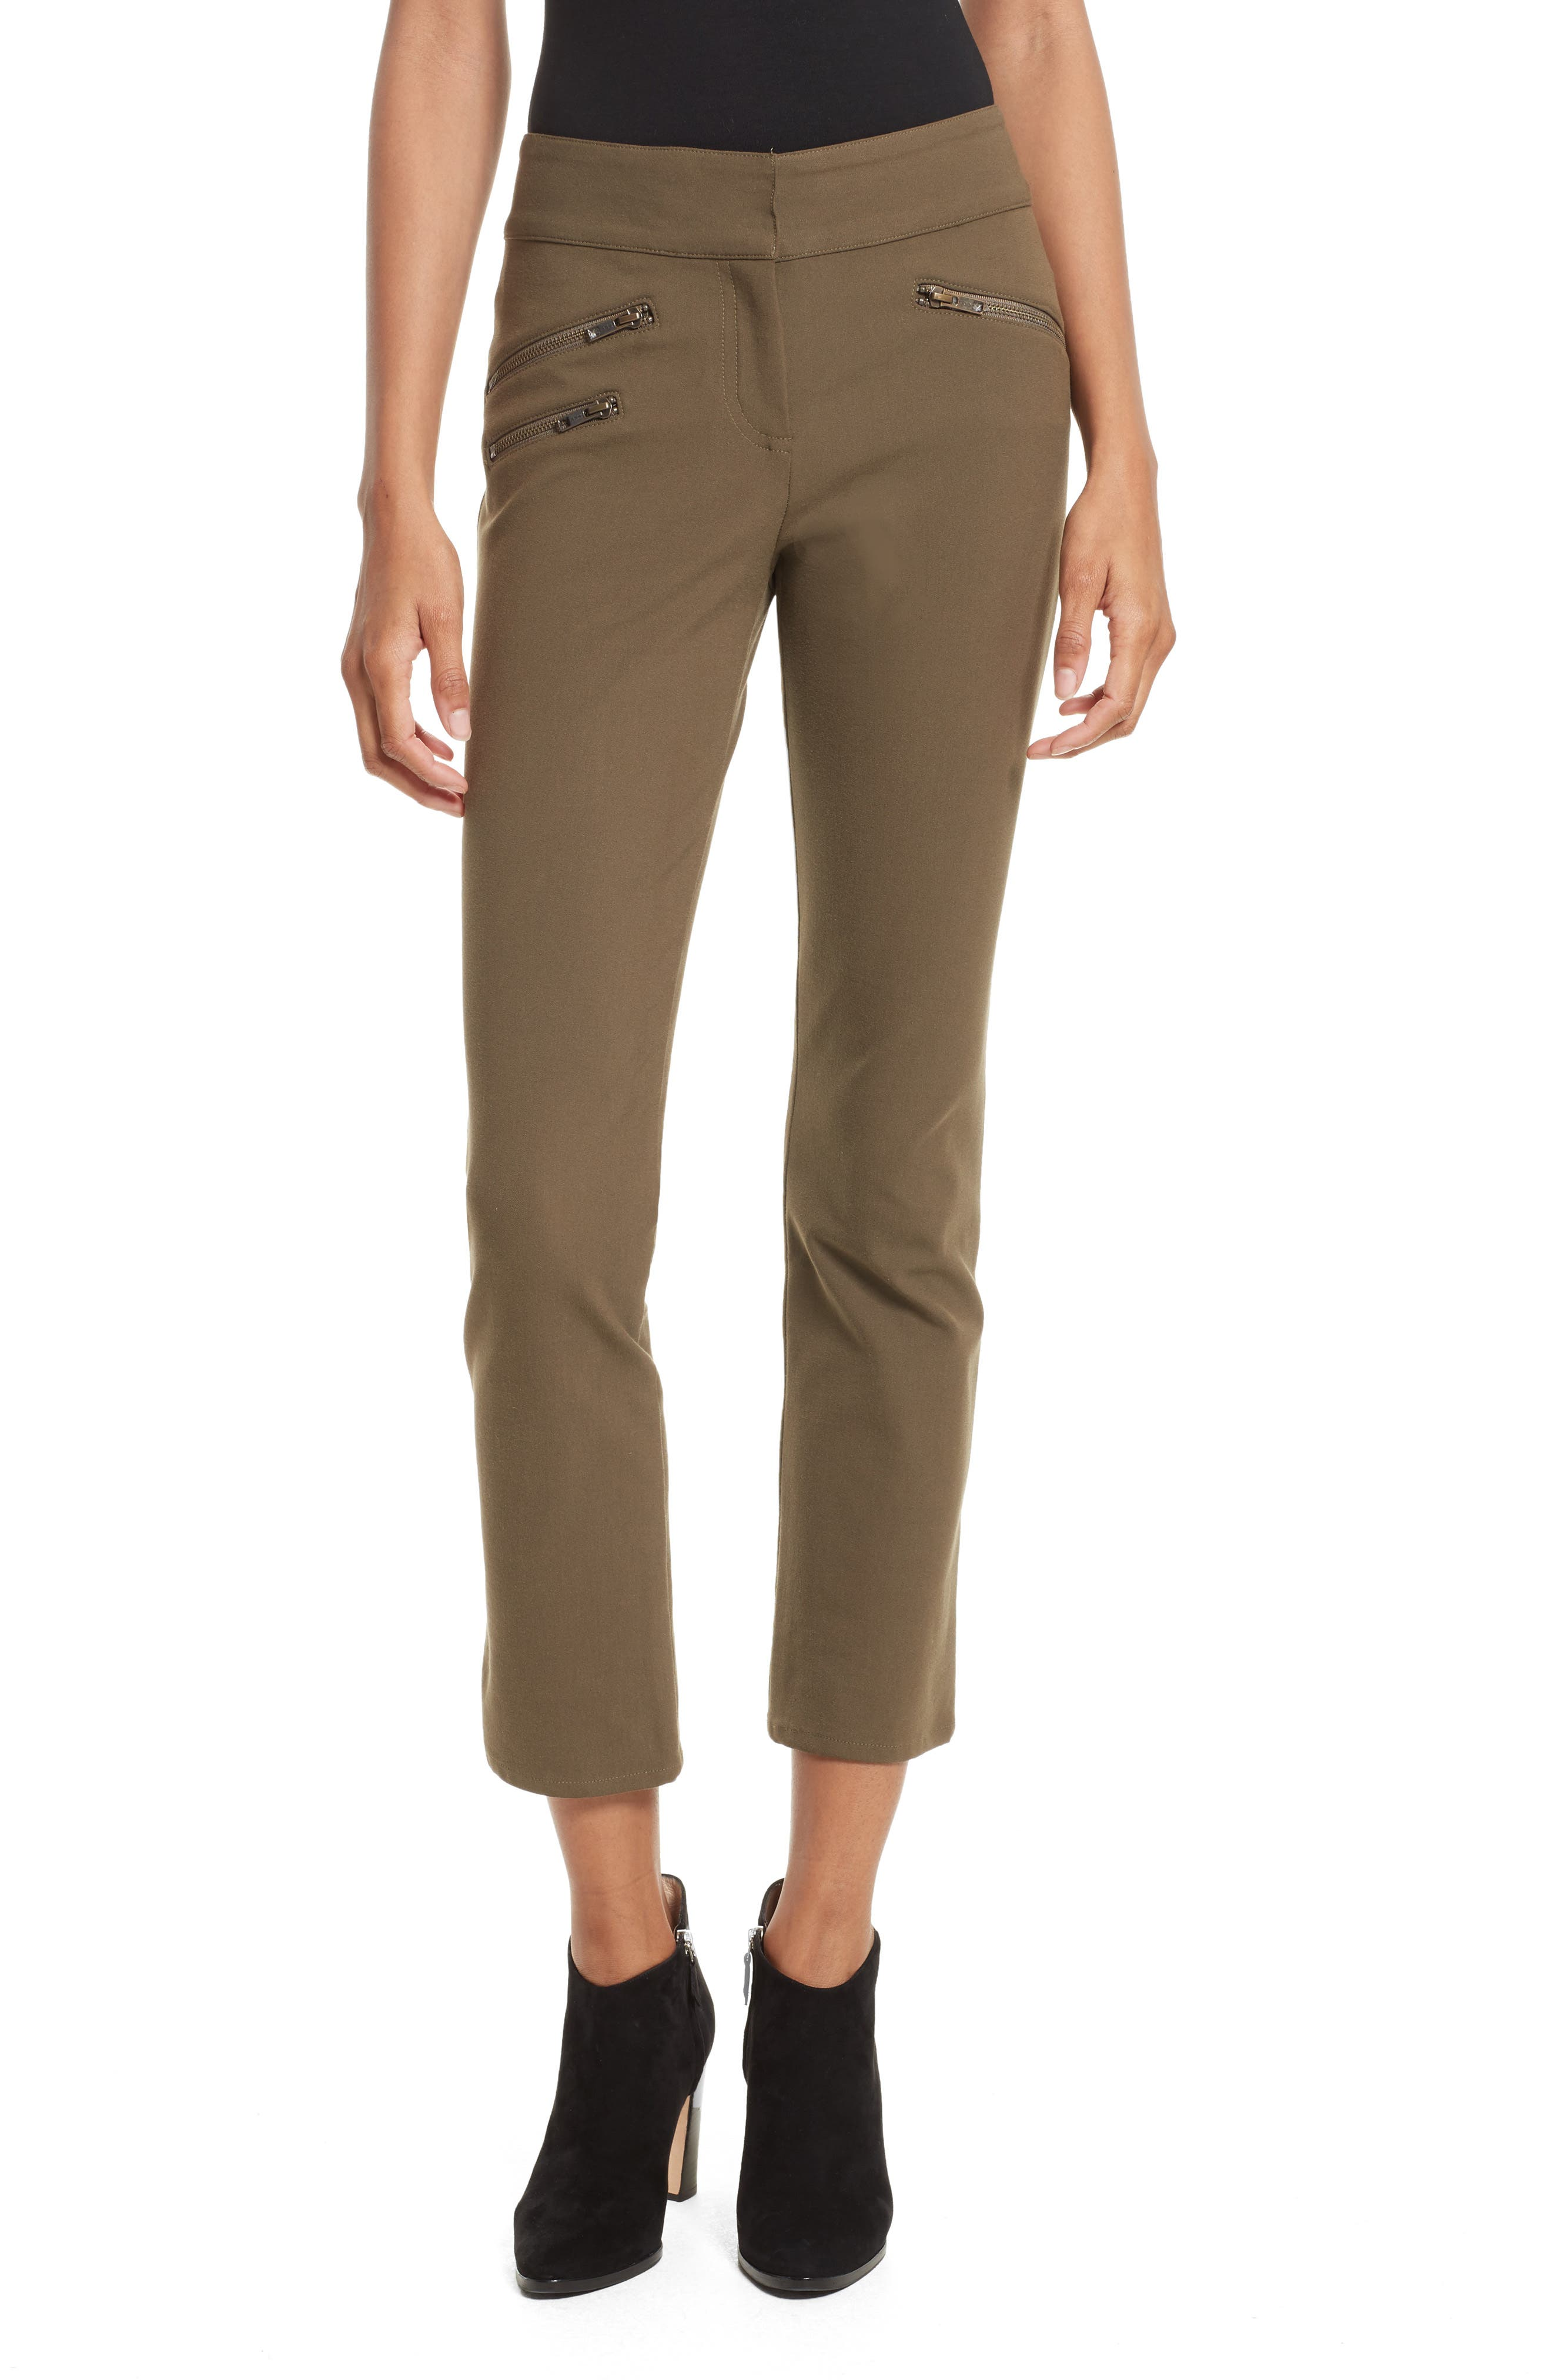 Alternate Image 1 Selected - Veronica Beard Adelaide Zipper Detail Crop Pants